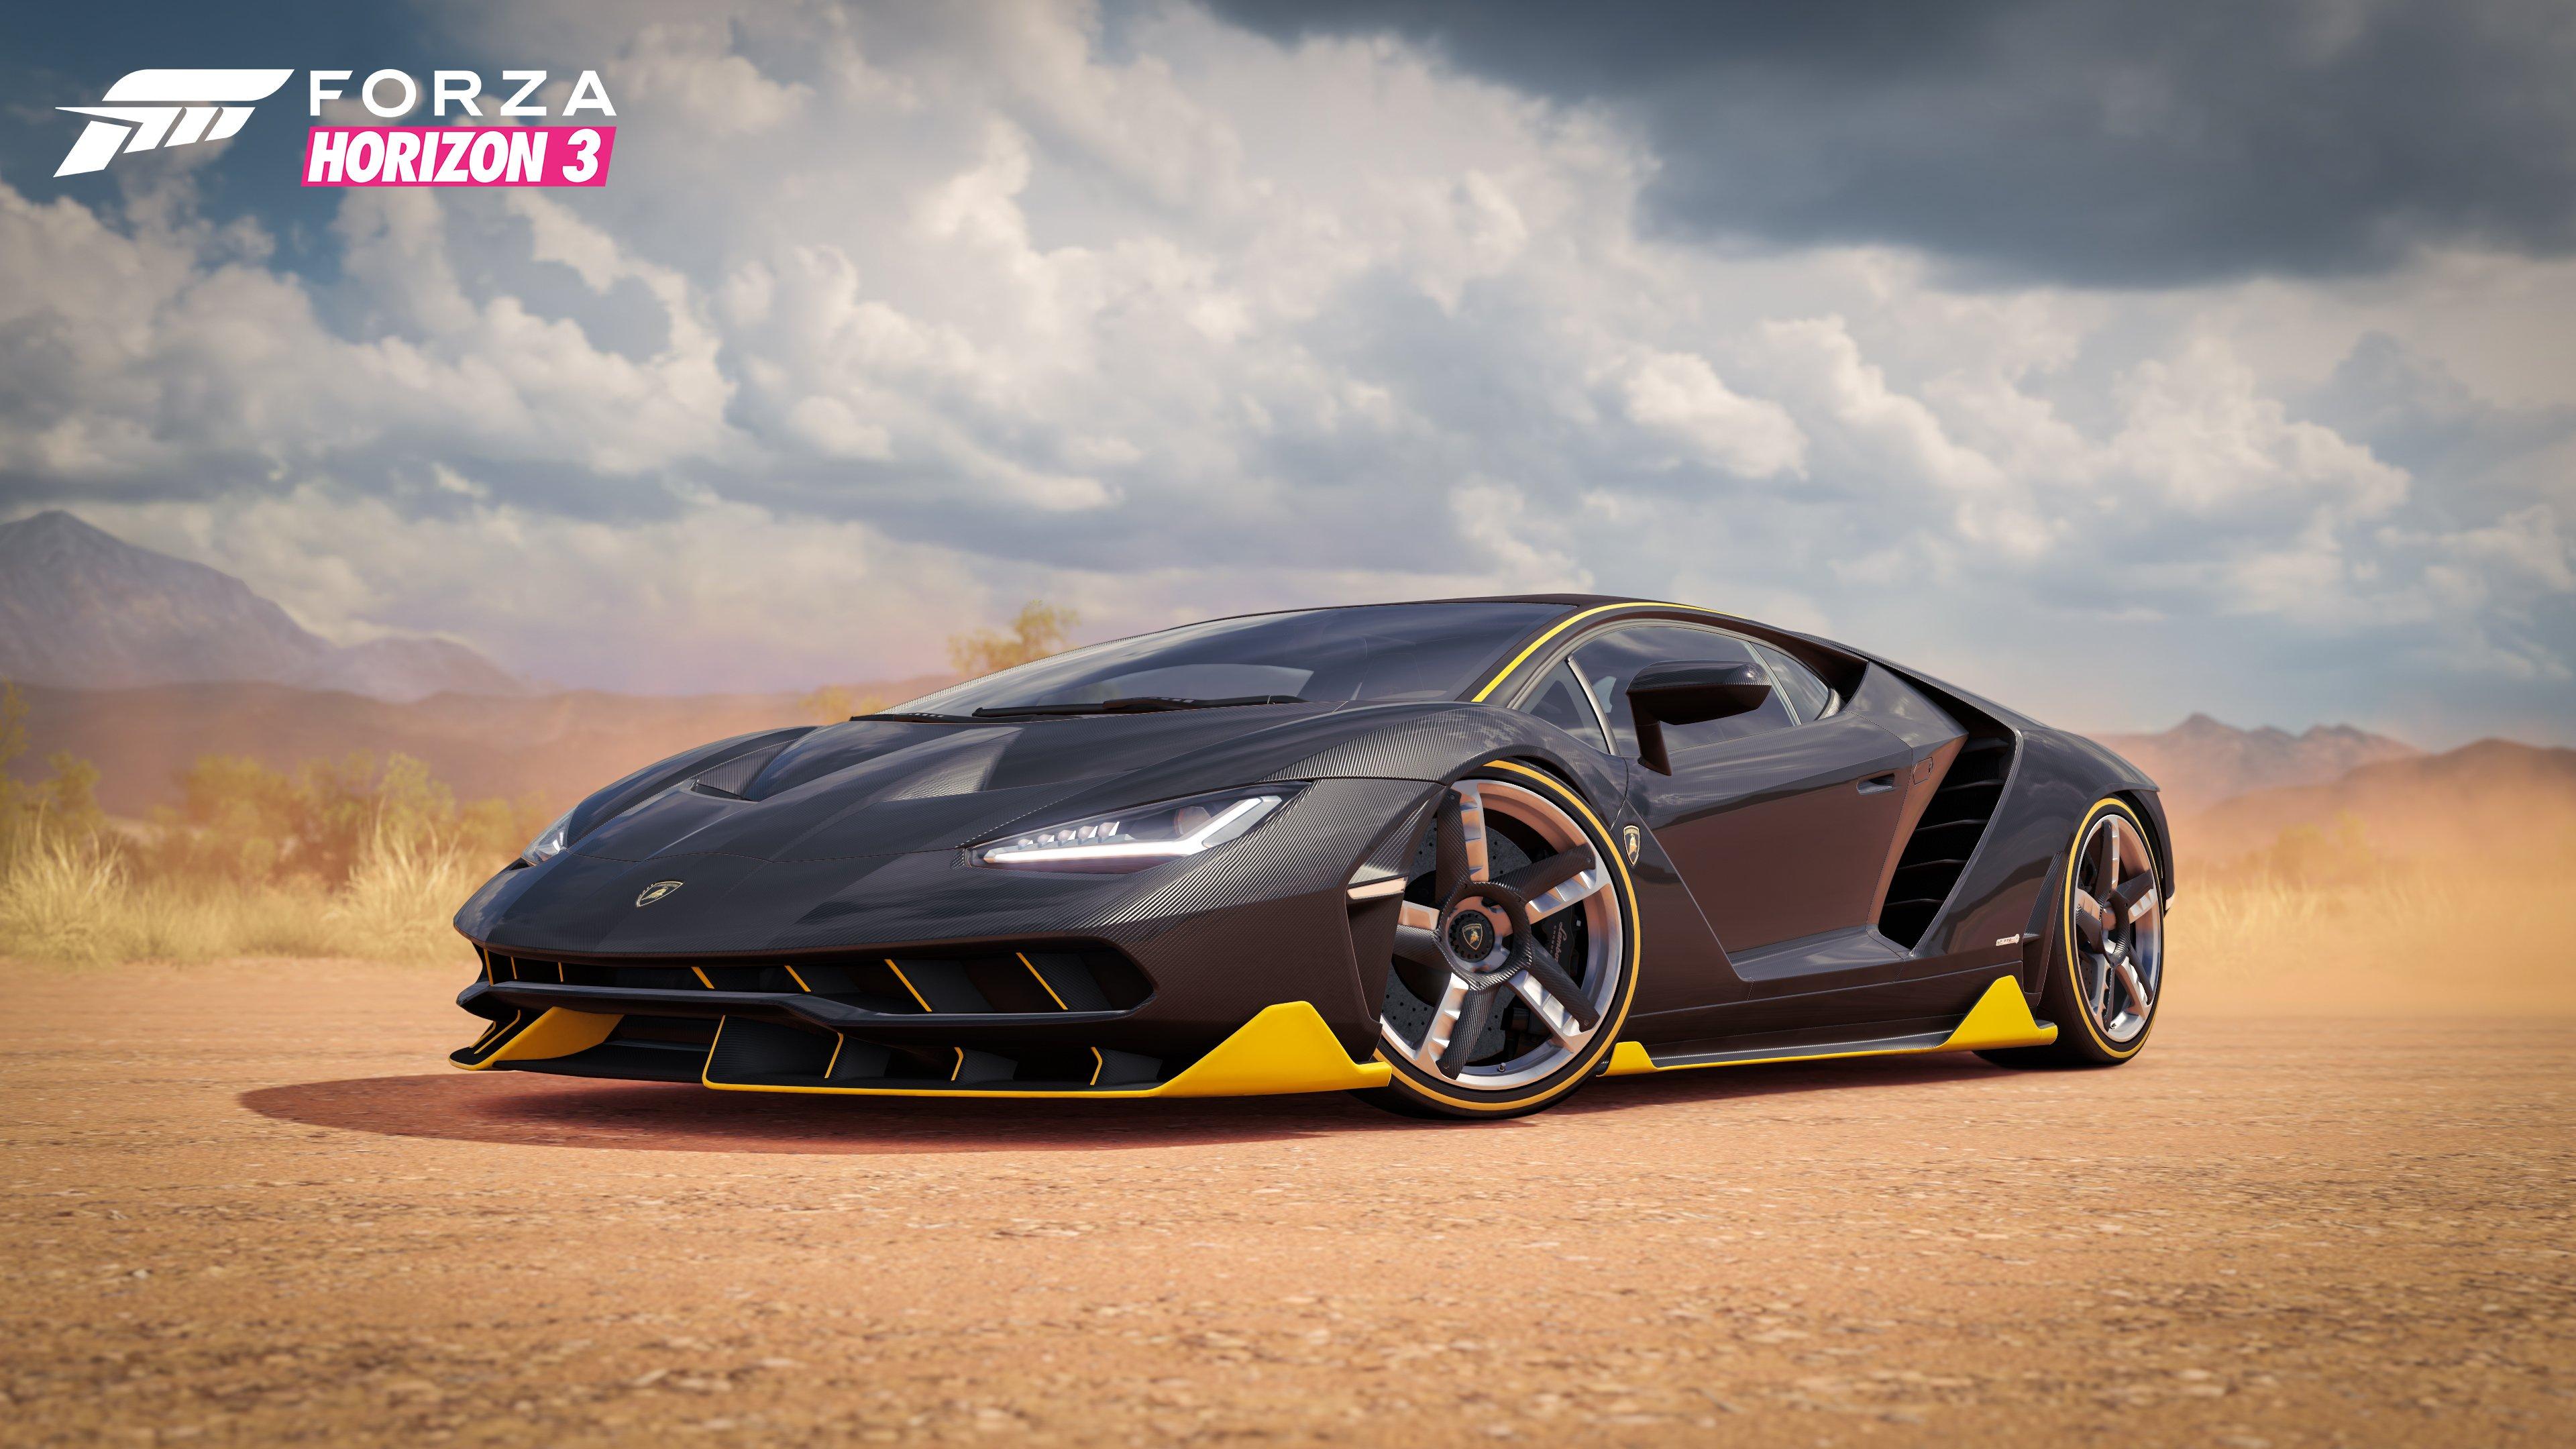 Forza Horizon 3 4K UHD Wallpaper